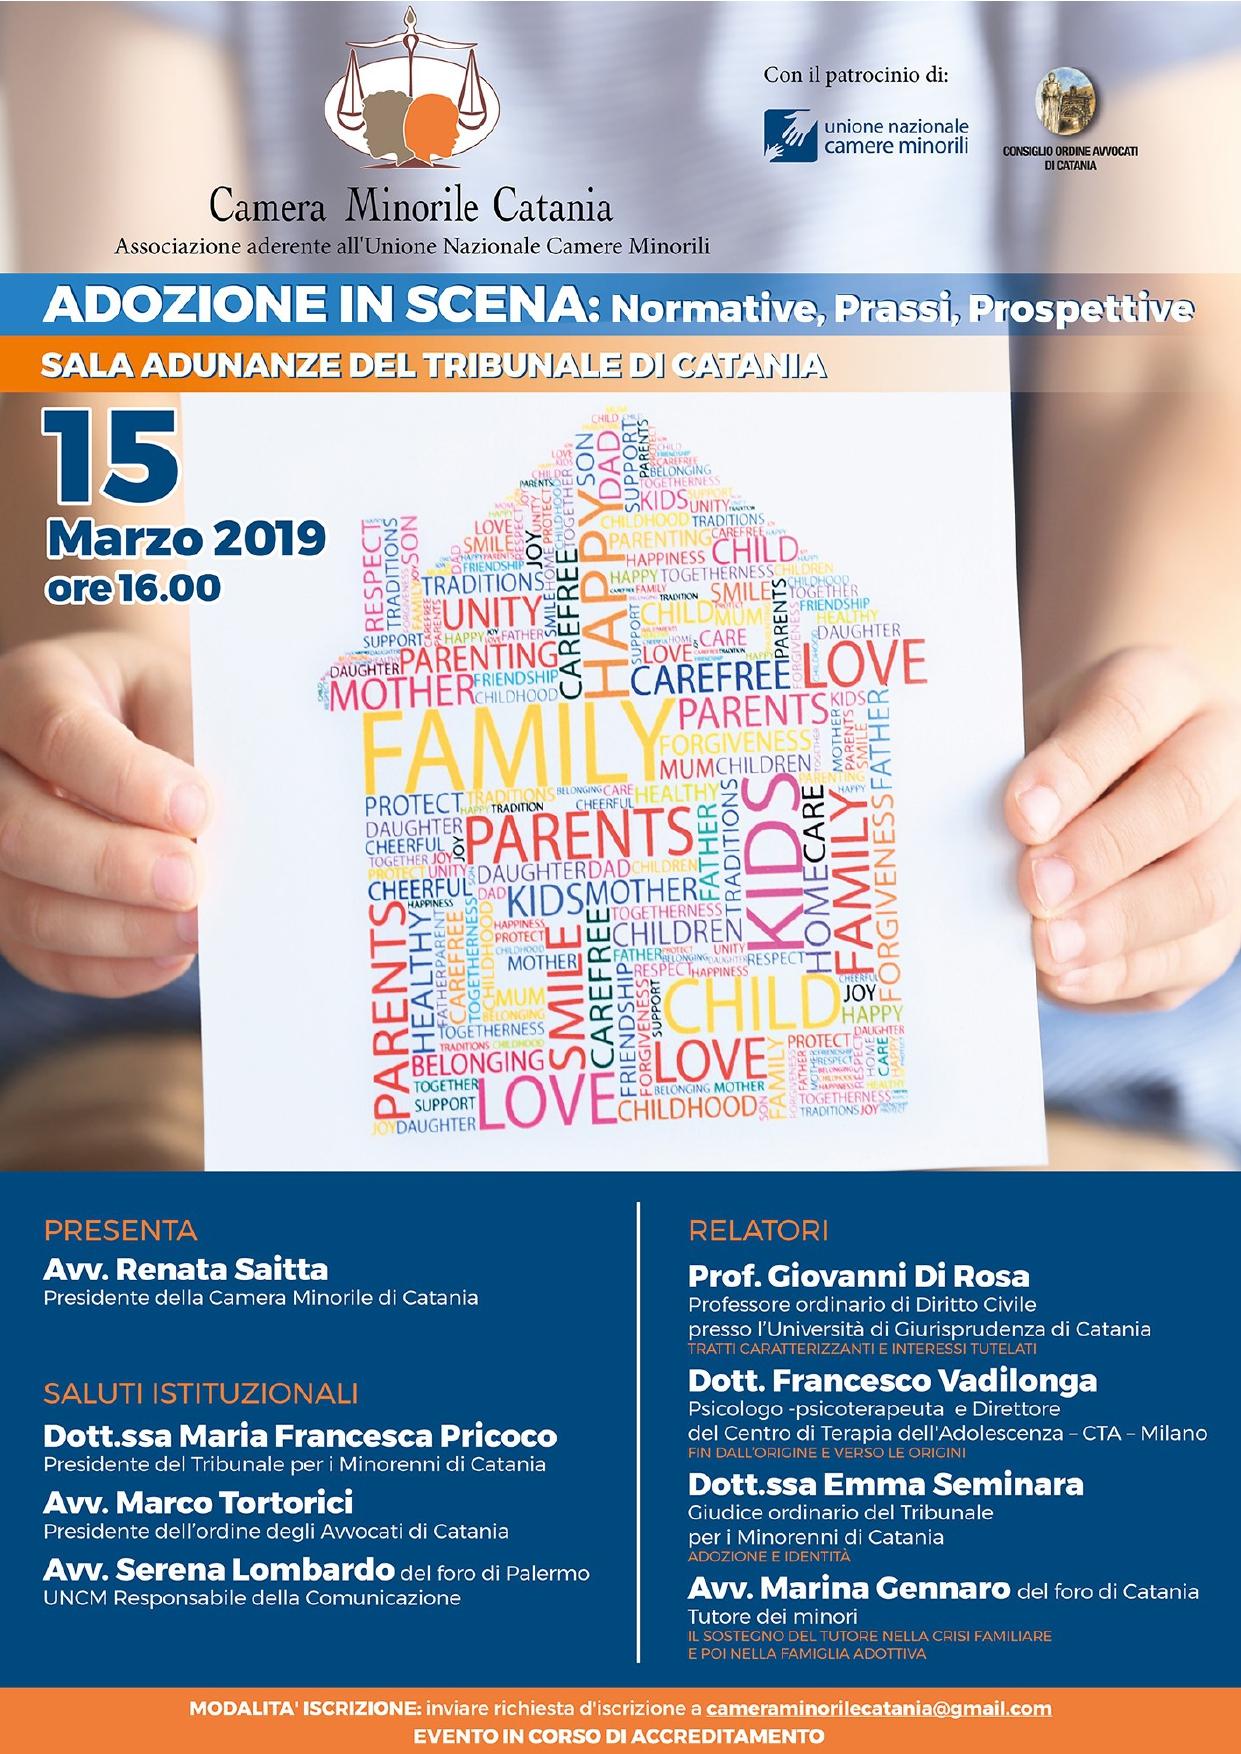 locandina 15-03-19 adozione in scena_pages-to-jpg-0001